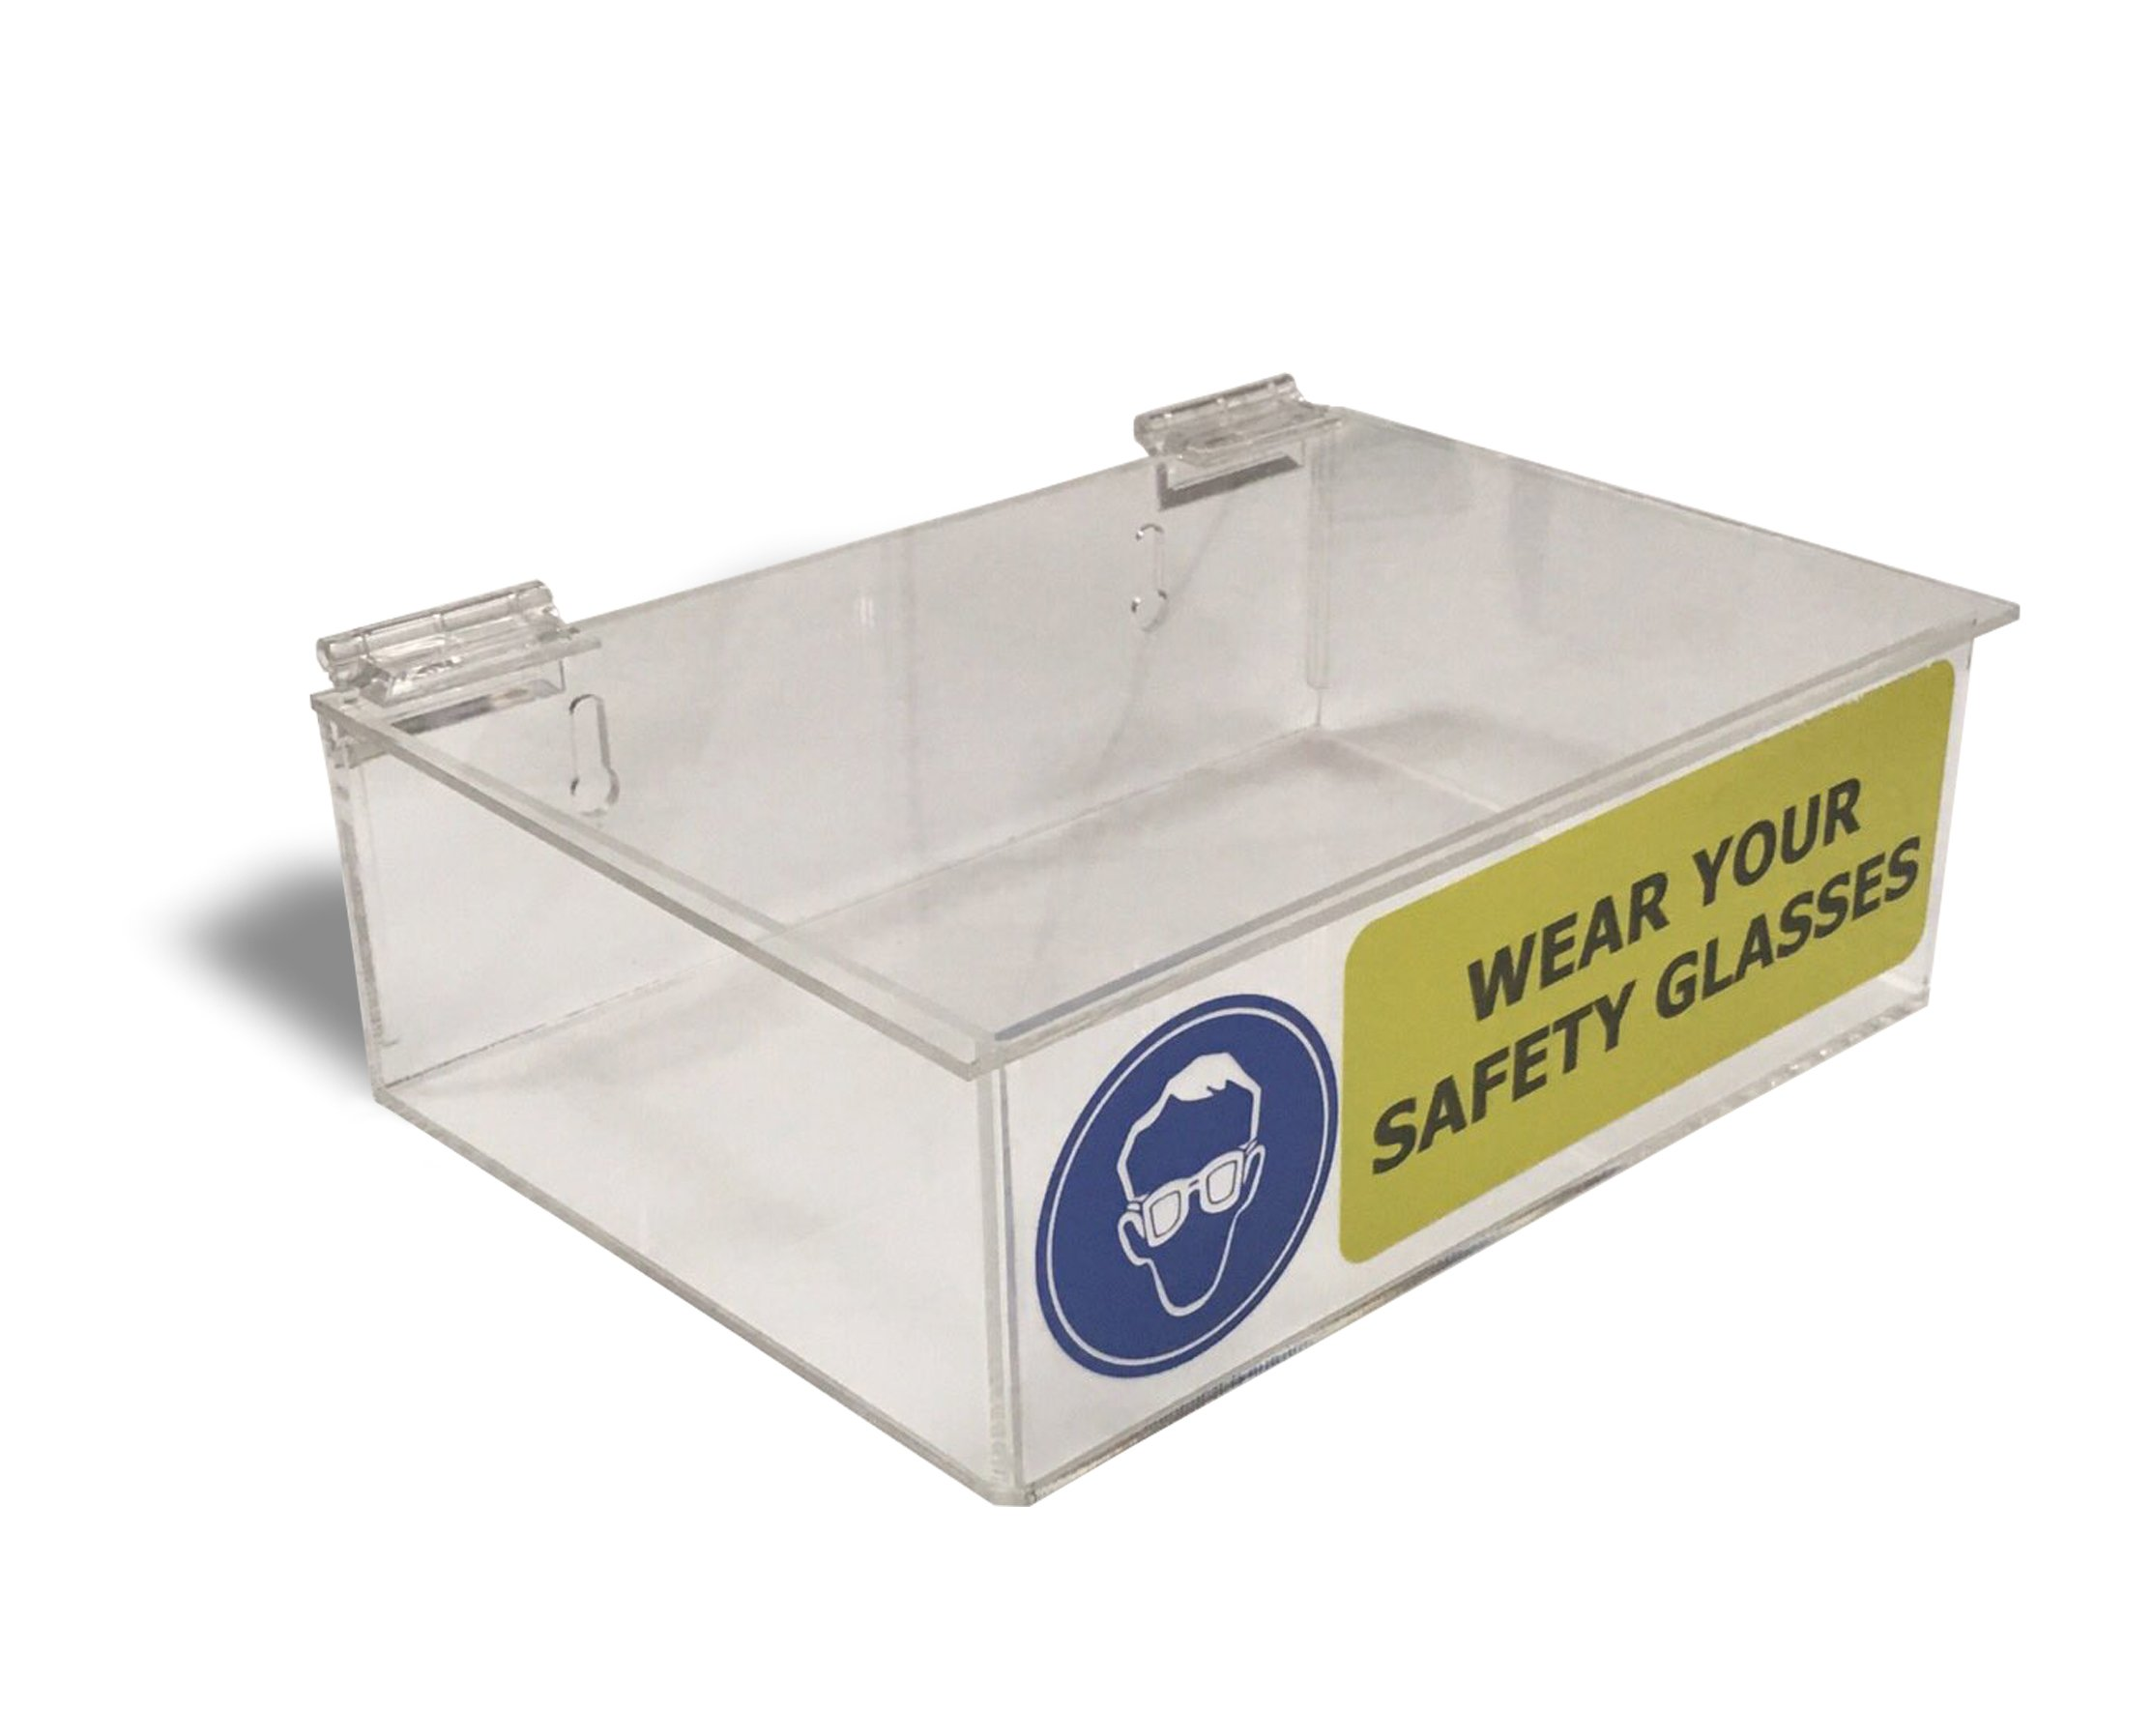 Acrylic Safety Glasses Dispenser